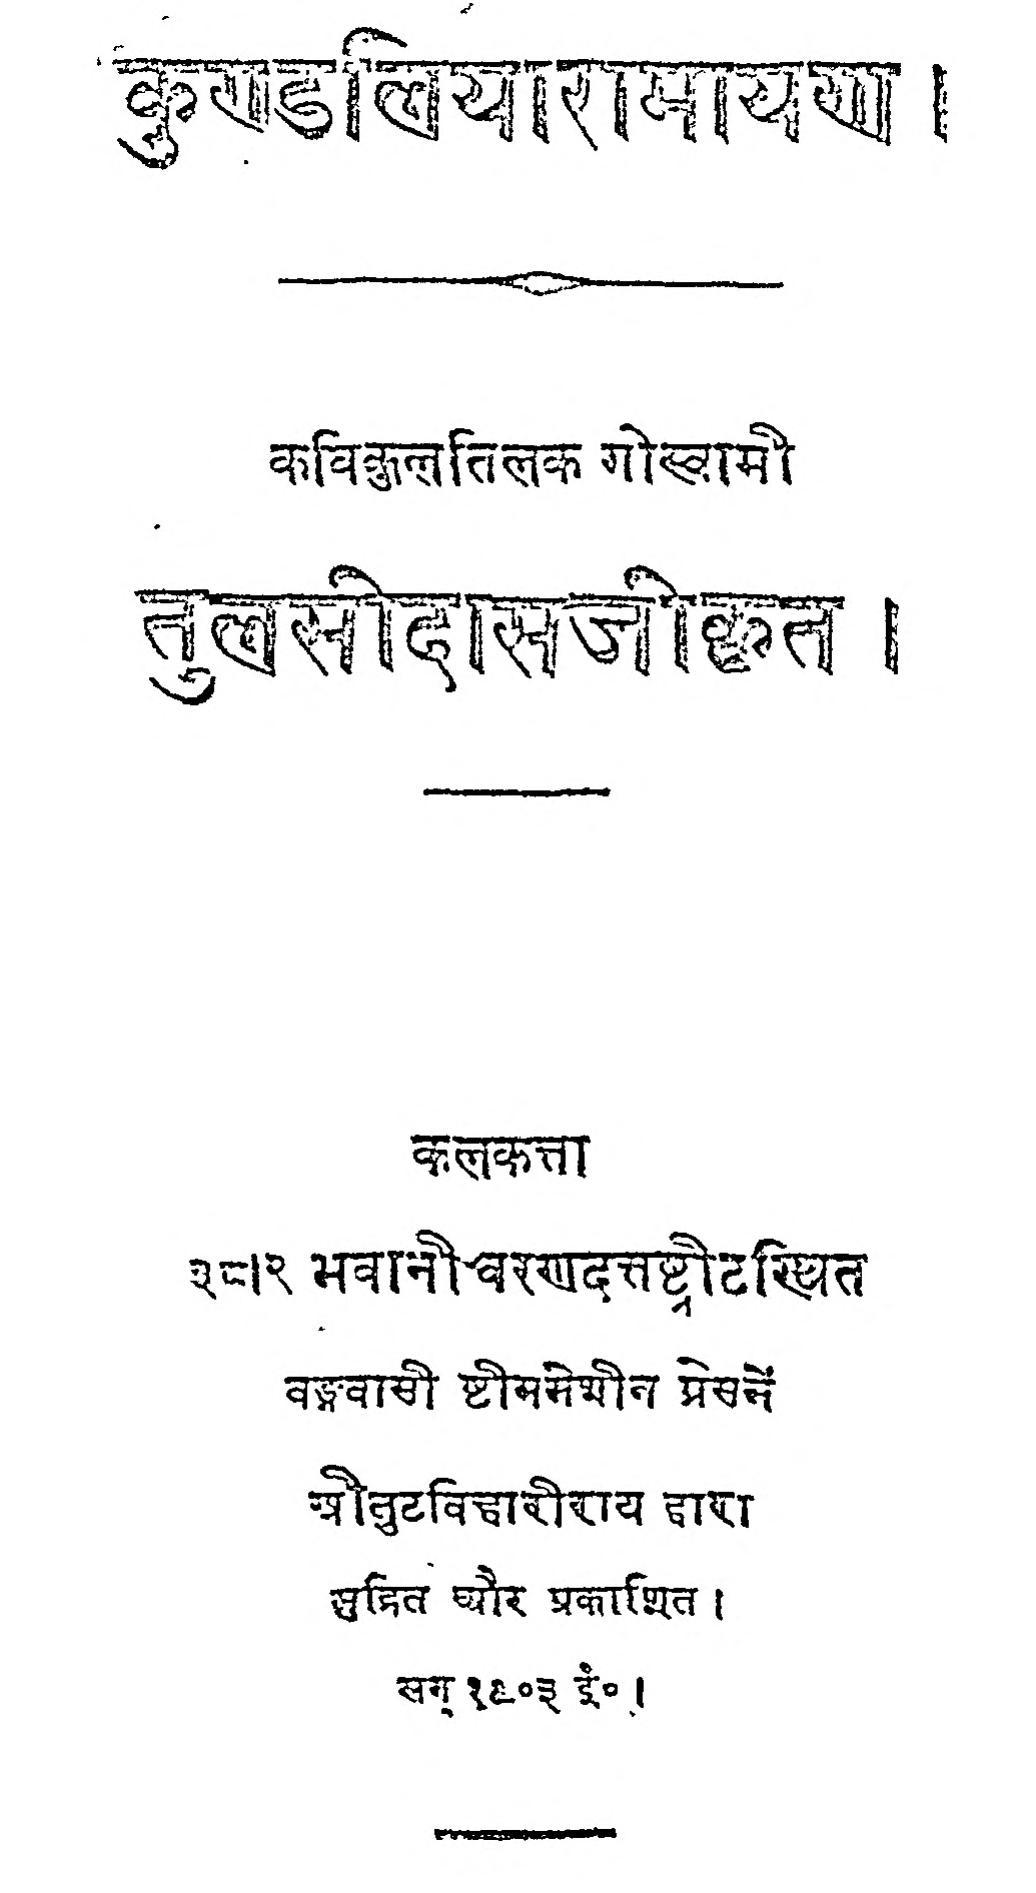 Book Image : कुण्डलियारामायण - Kundliyaramayan